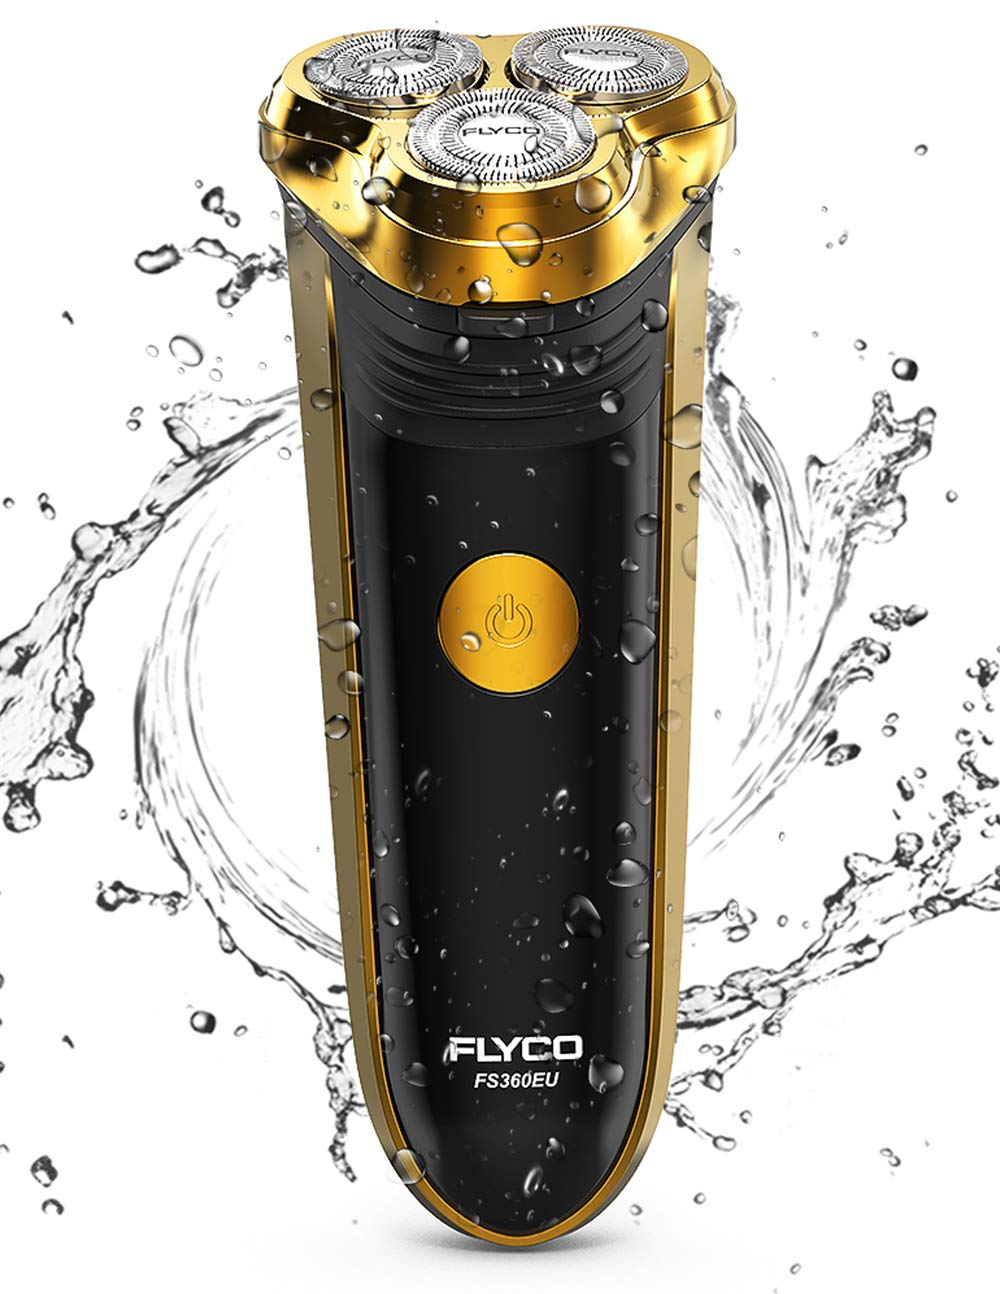 FLYCO Rasoio Elettrico Barba Uomo Ricaricabile con 3 Testine Rotanti